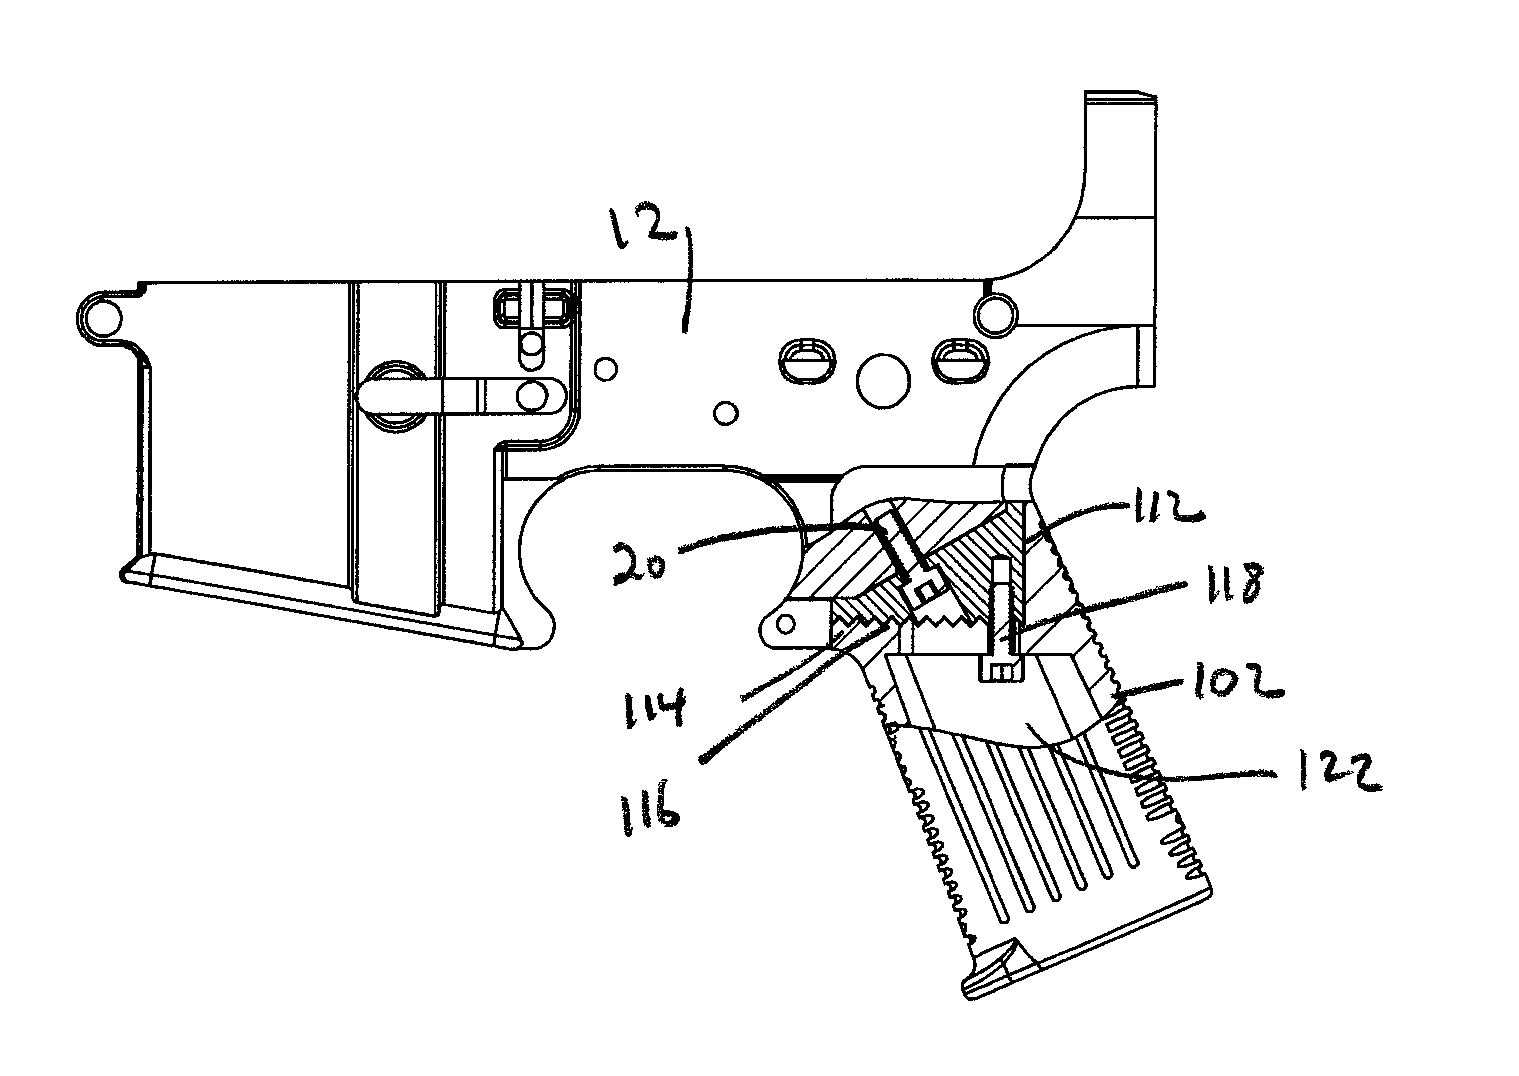 Drawn gun ar 15 Google Patent US8752323 Drawing grip